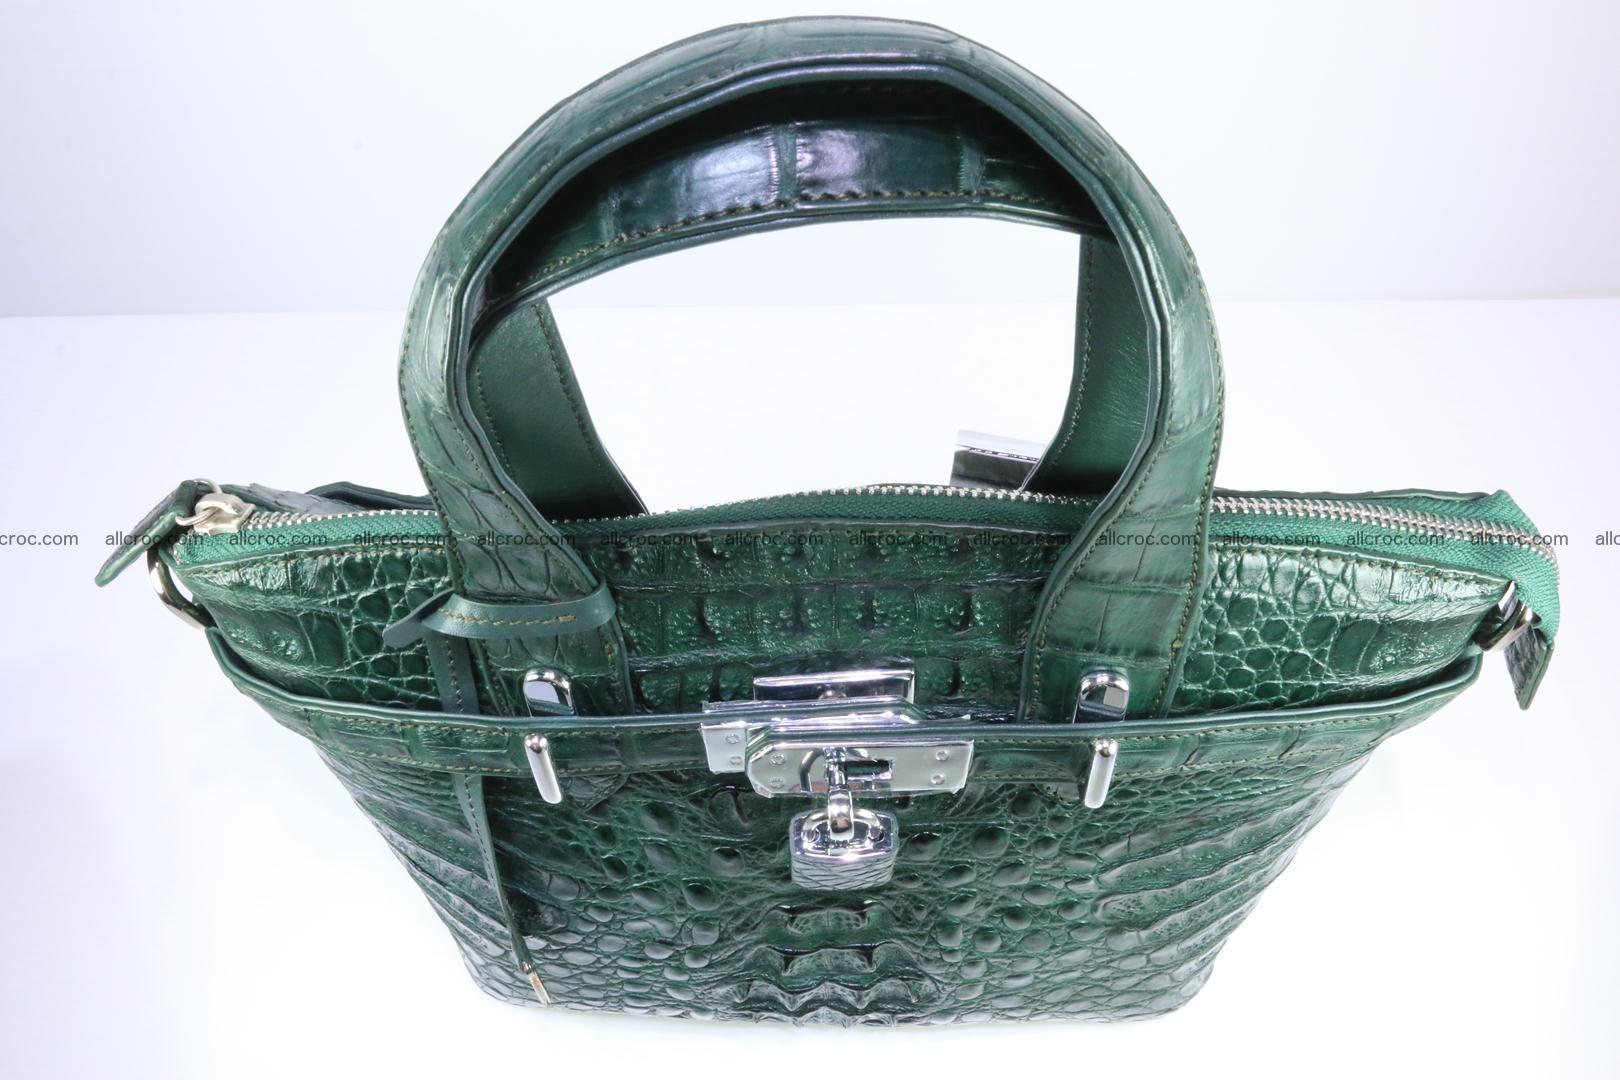 Genuine crocodile handbag for ladies 047 Foto 8